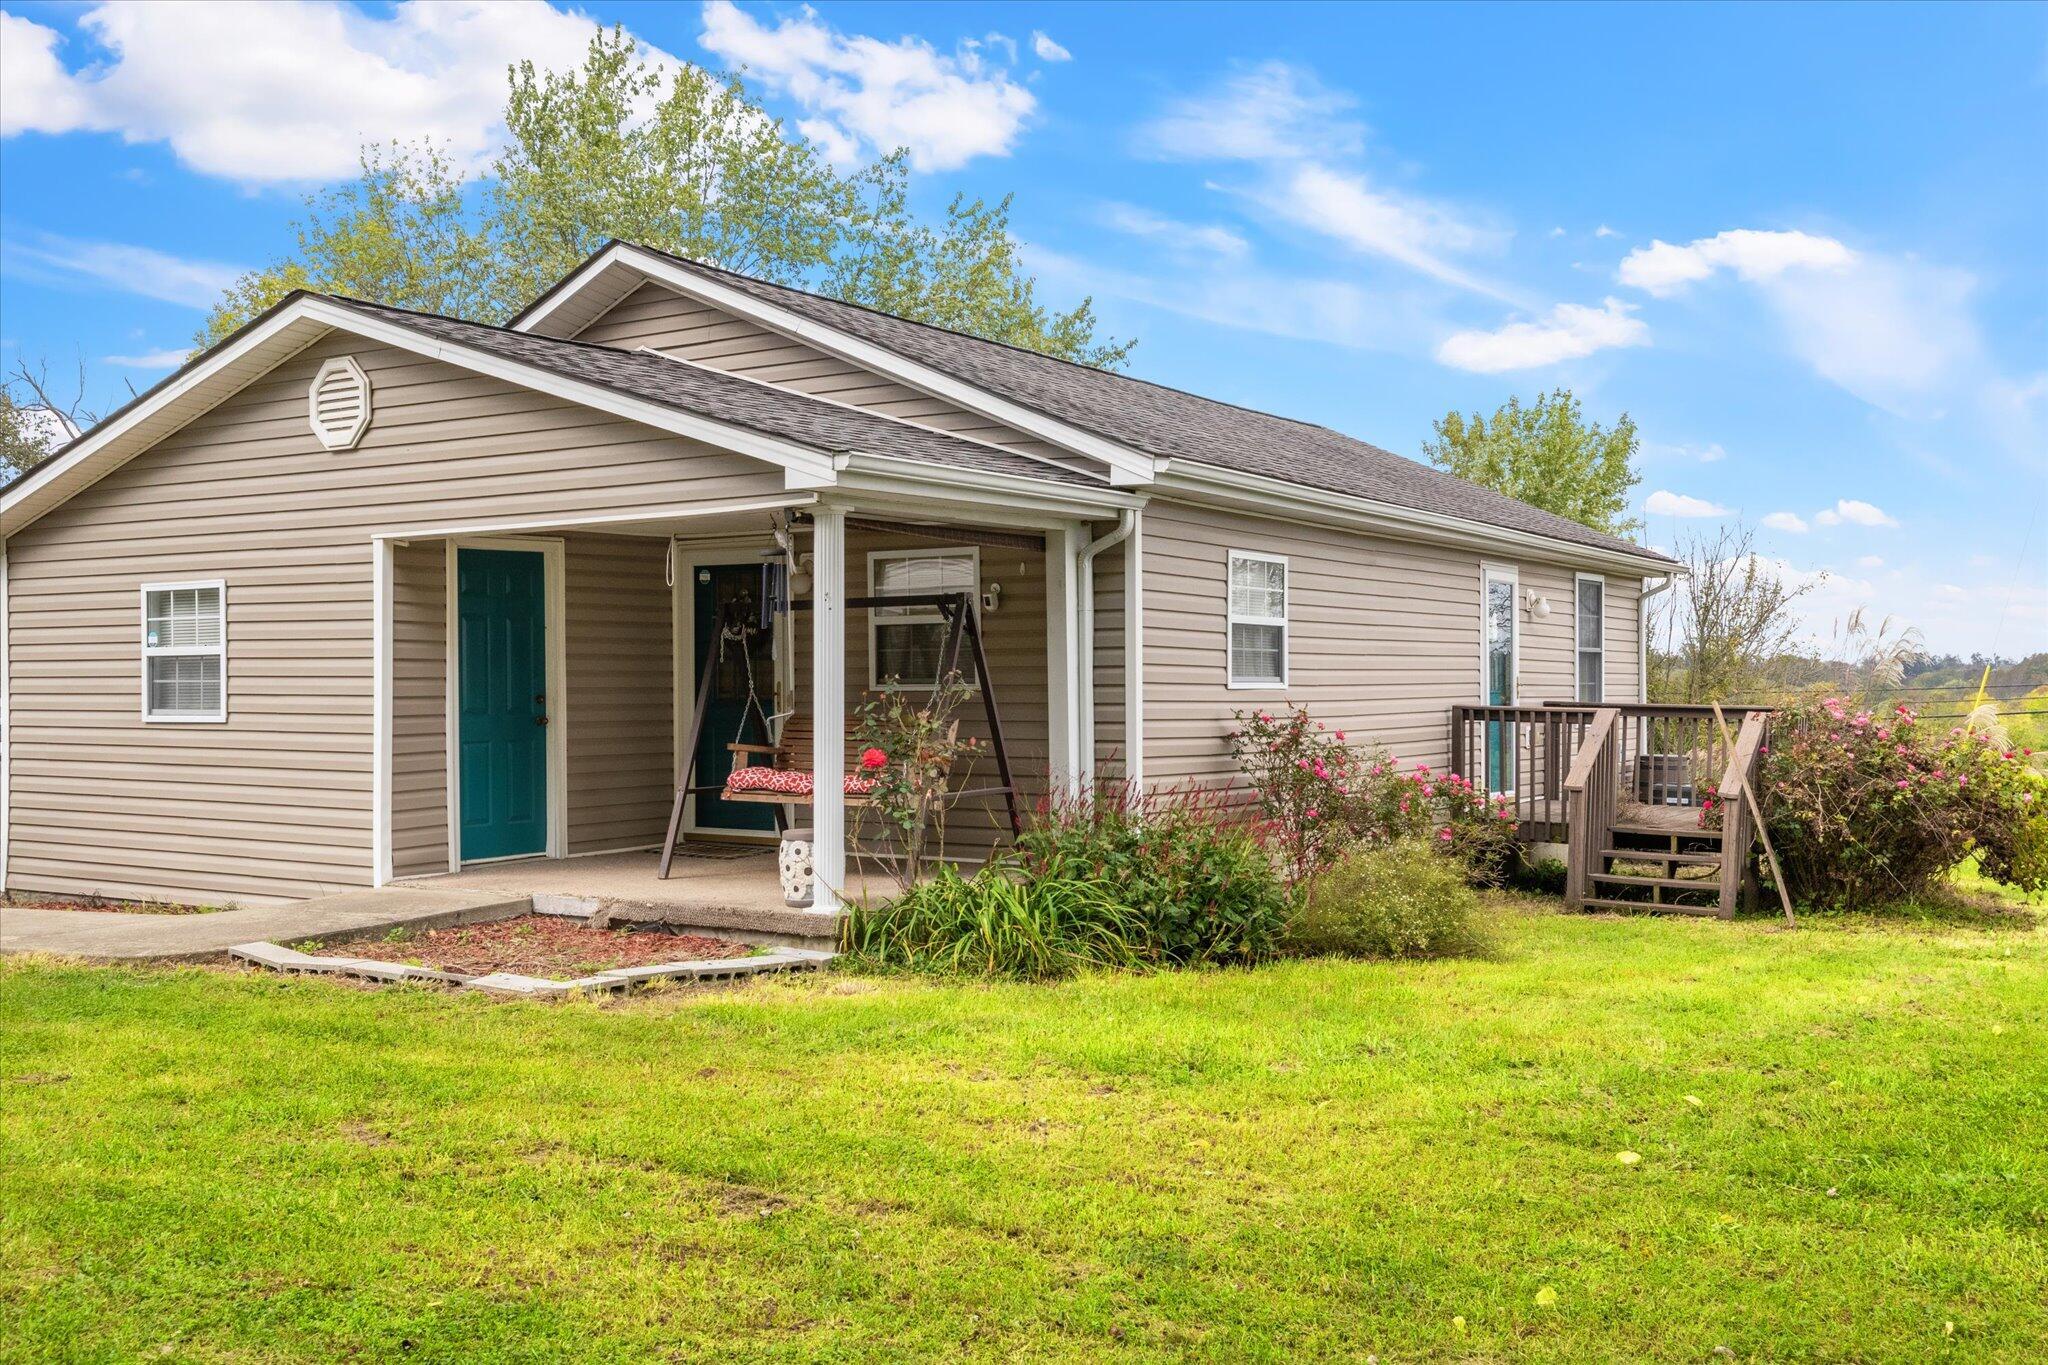 1673 Richmond Road, Berea, Kentucky 40403, 2 Bedrooms Bedrooms, ,1 BathroomBathrooms,Residential,For Sale,Richmond,20123002